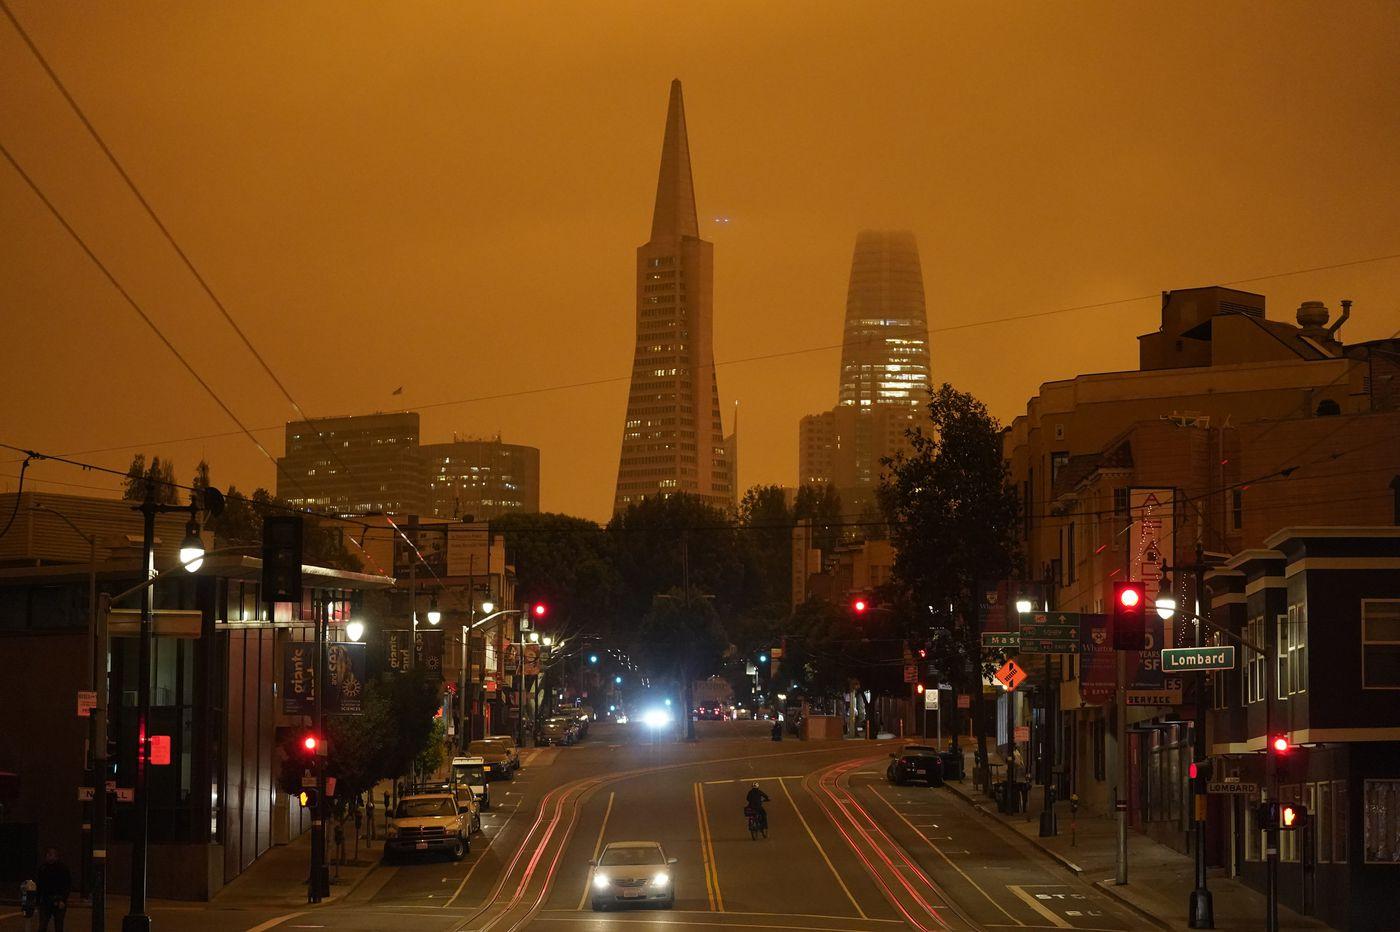 Massive smoke clouds from wildfires darken skies over California, Oregon and Washington